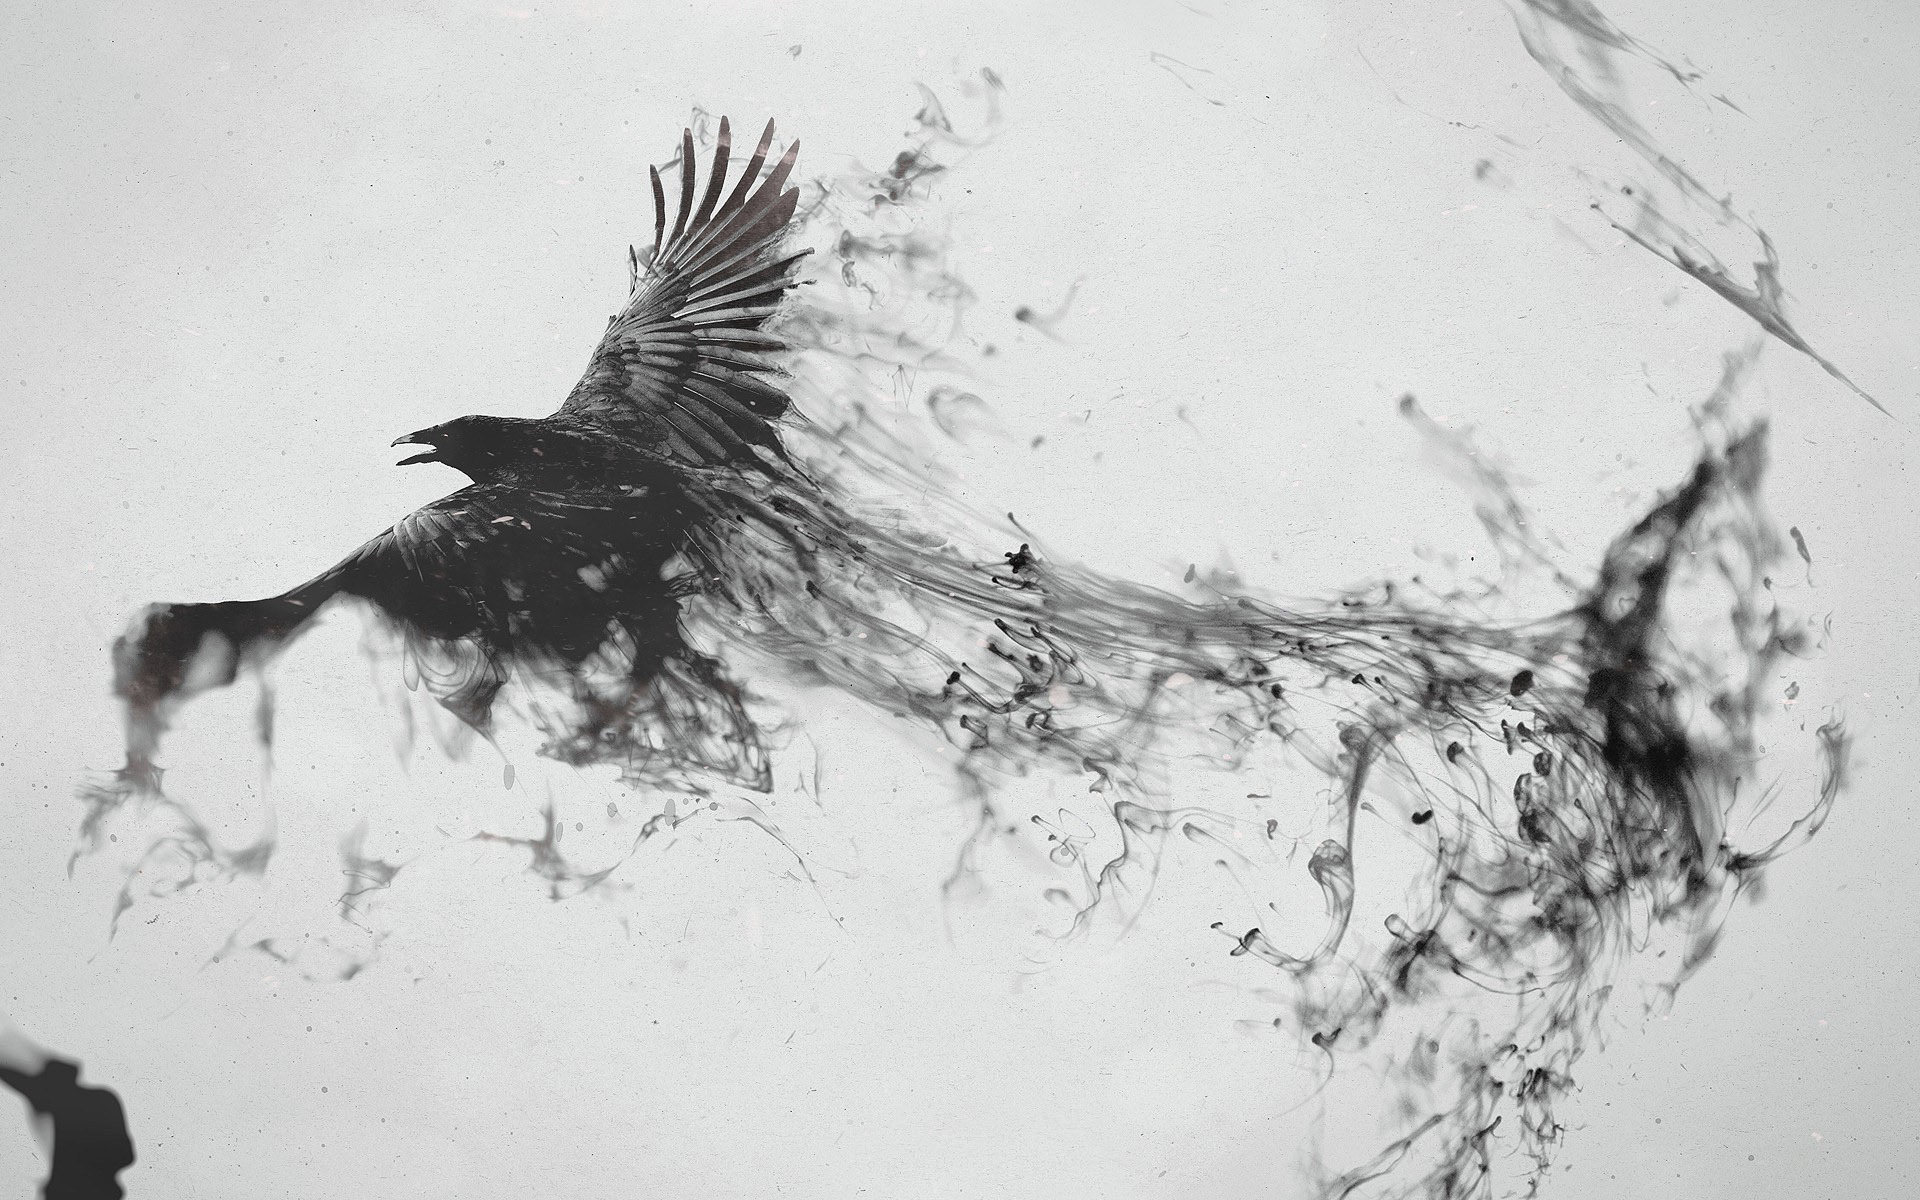 Crow Turning Into Smoke Wallpaper 14570 1920x1200